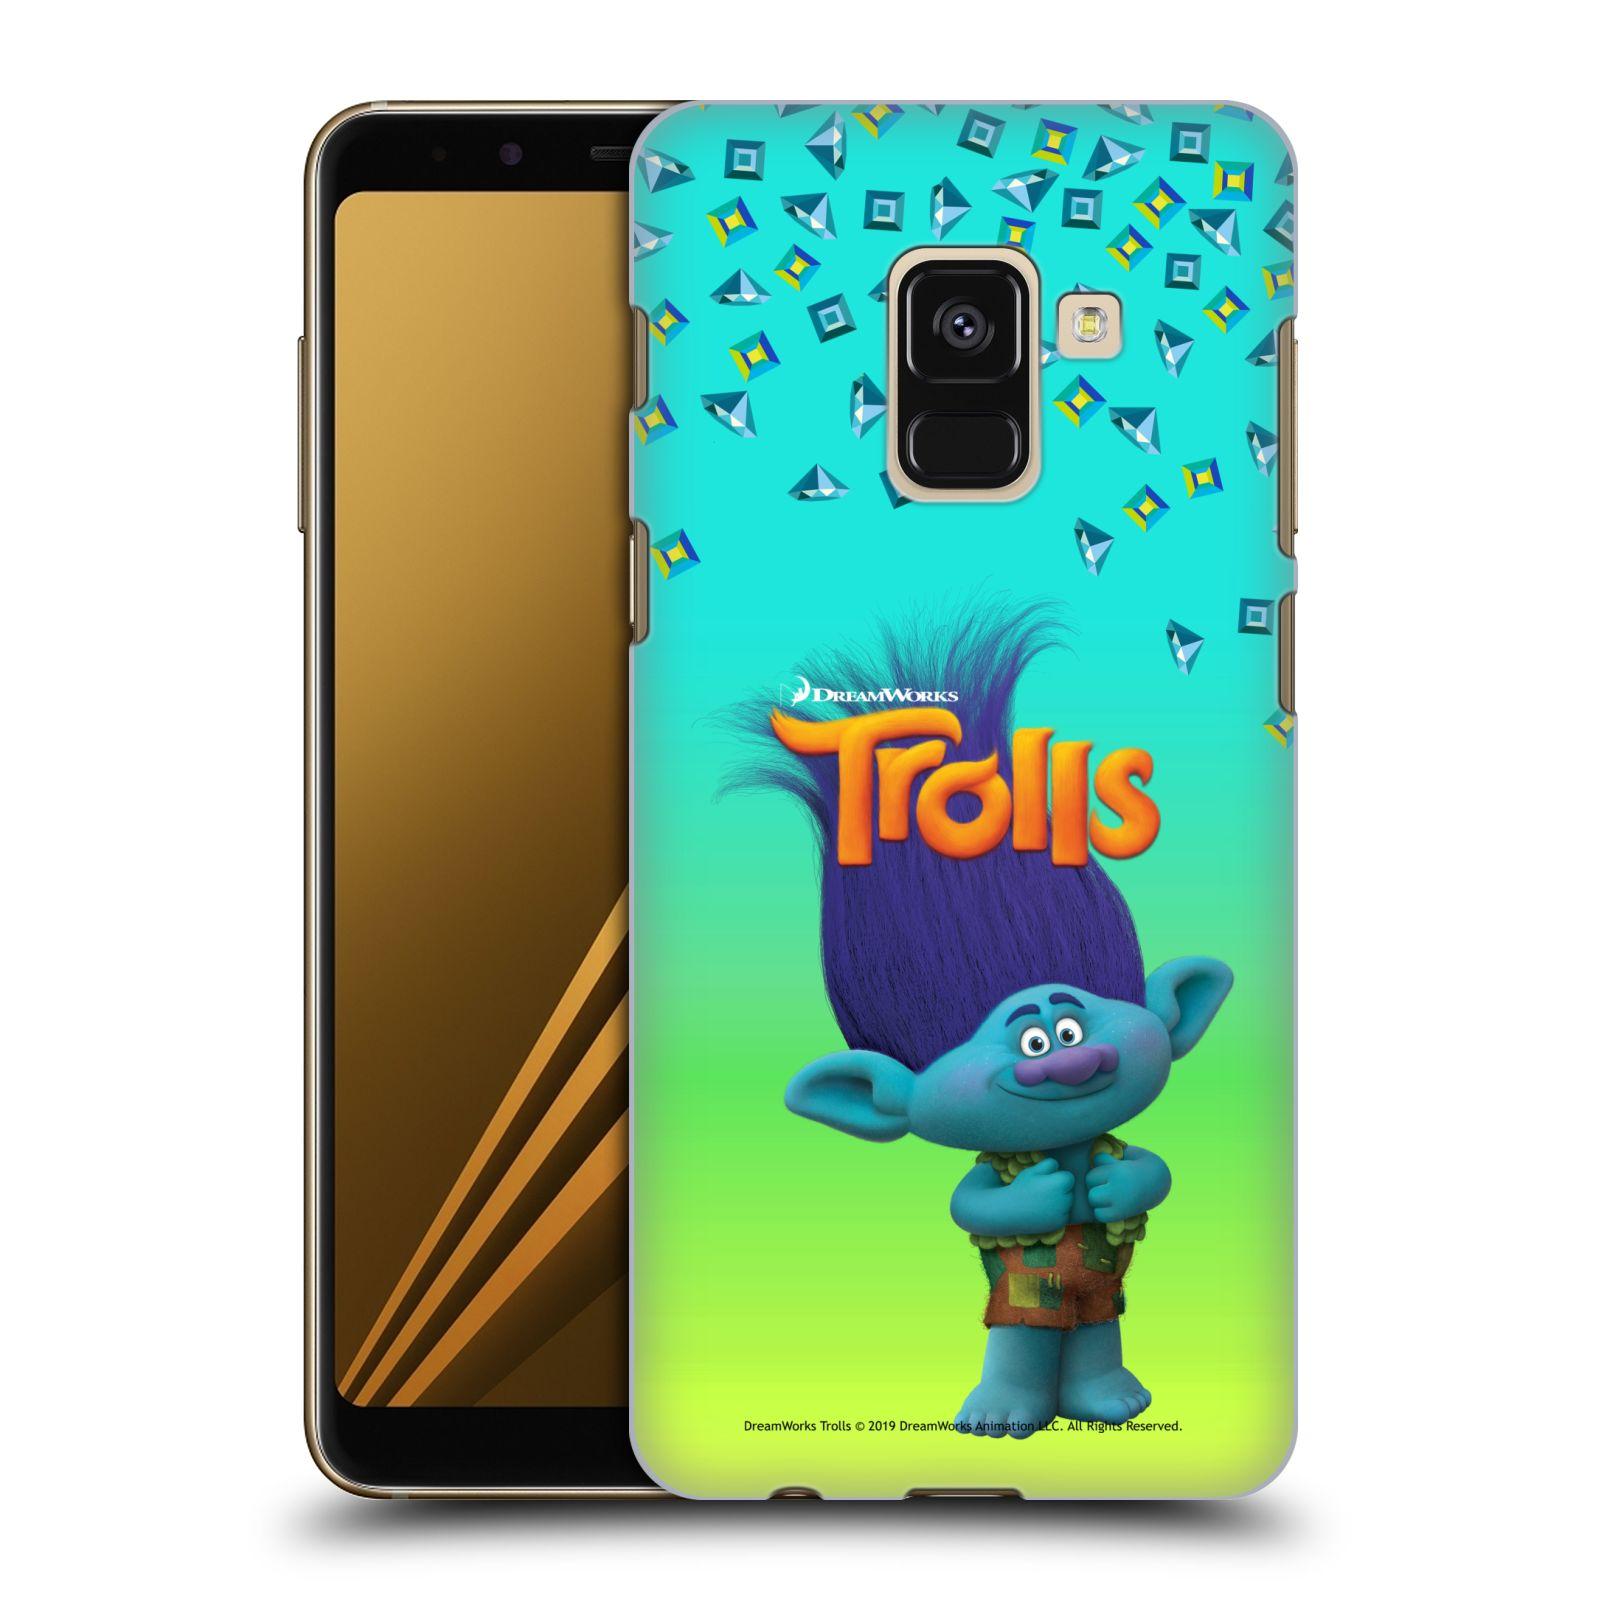 Pouzdro na mobil Samsung Galaxy A8+ 2018, A8 PLUS 2018 - HEAD CASE - Pohádka - Trollové skřítek Branch